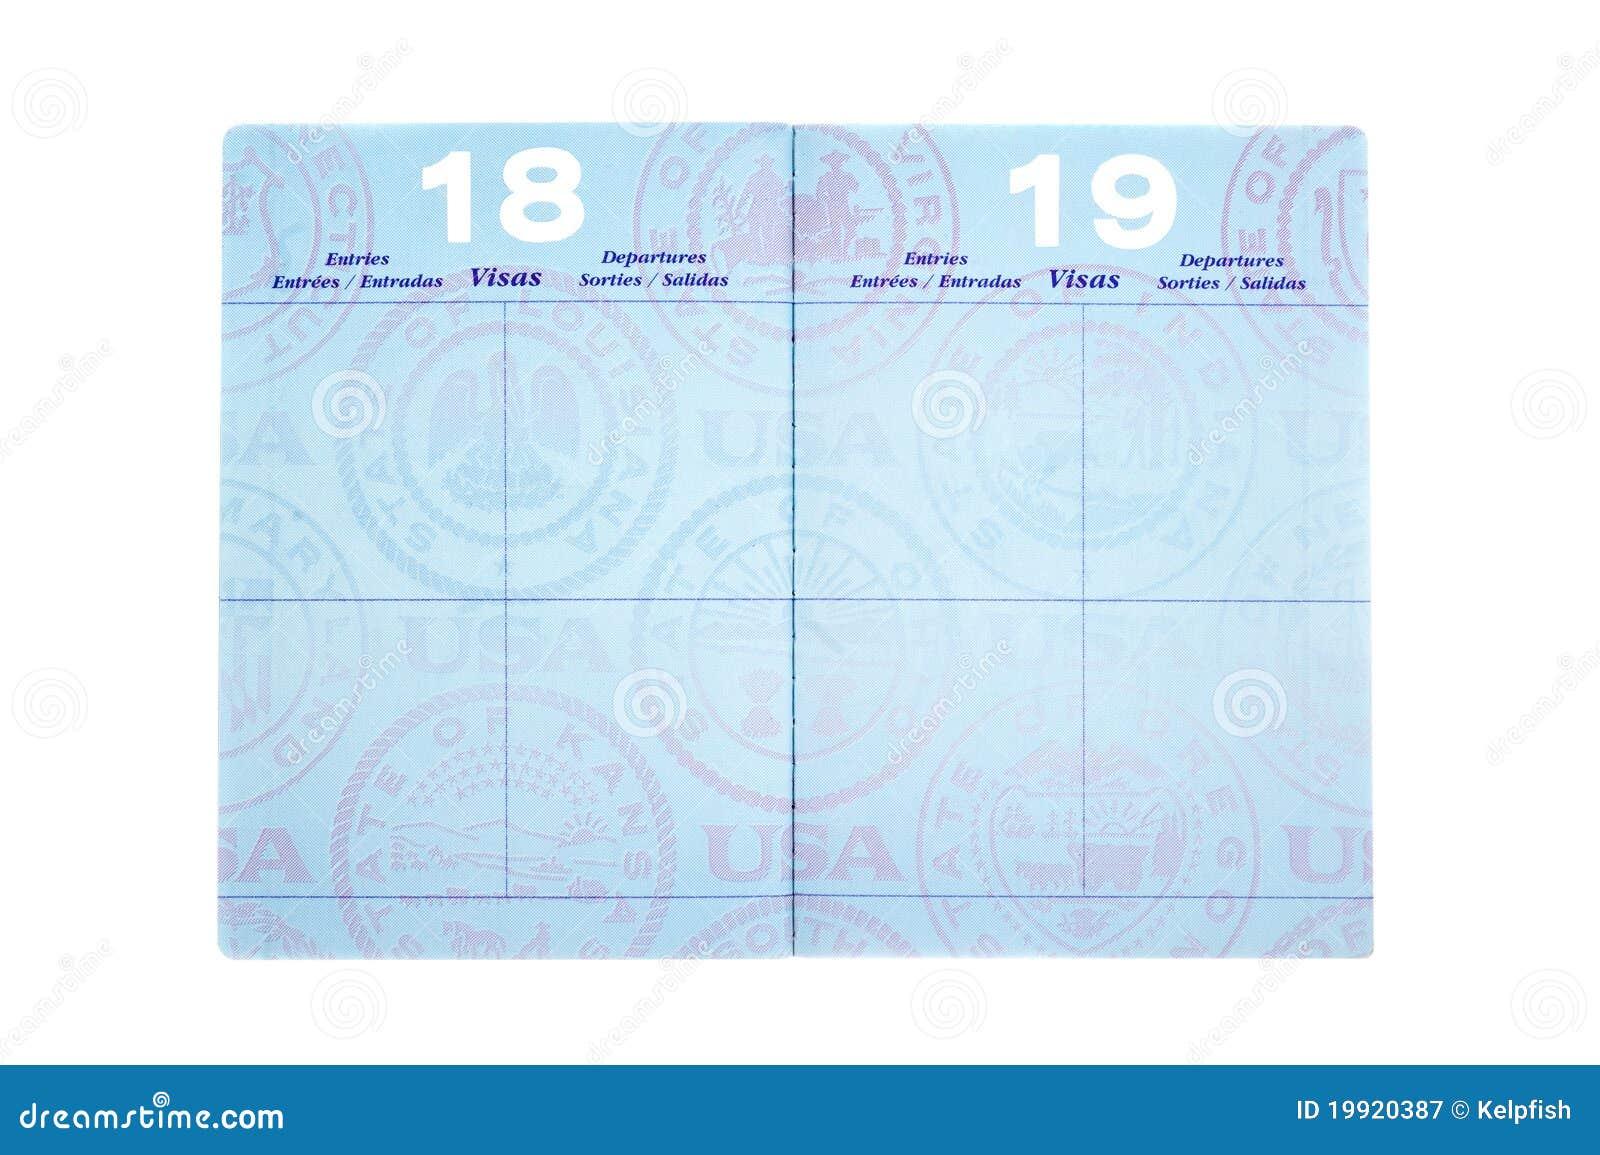 Travel Info Center: Indian Passport - Blank Passport Pages